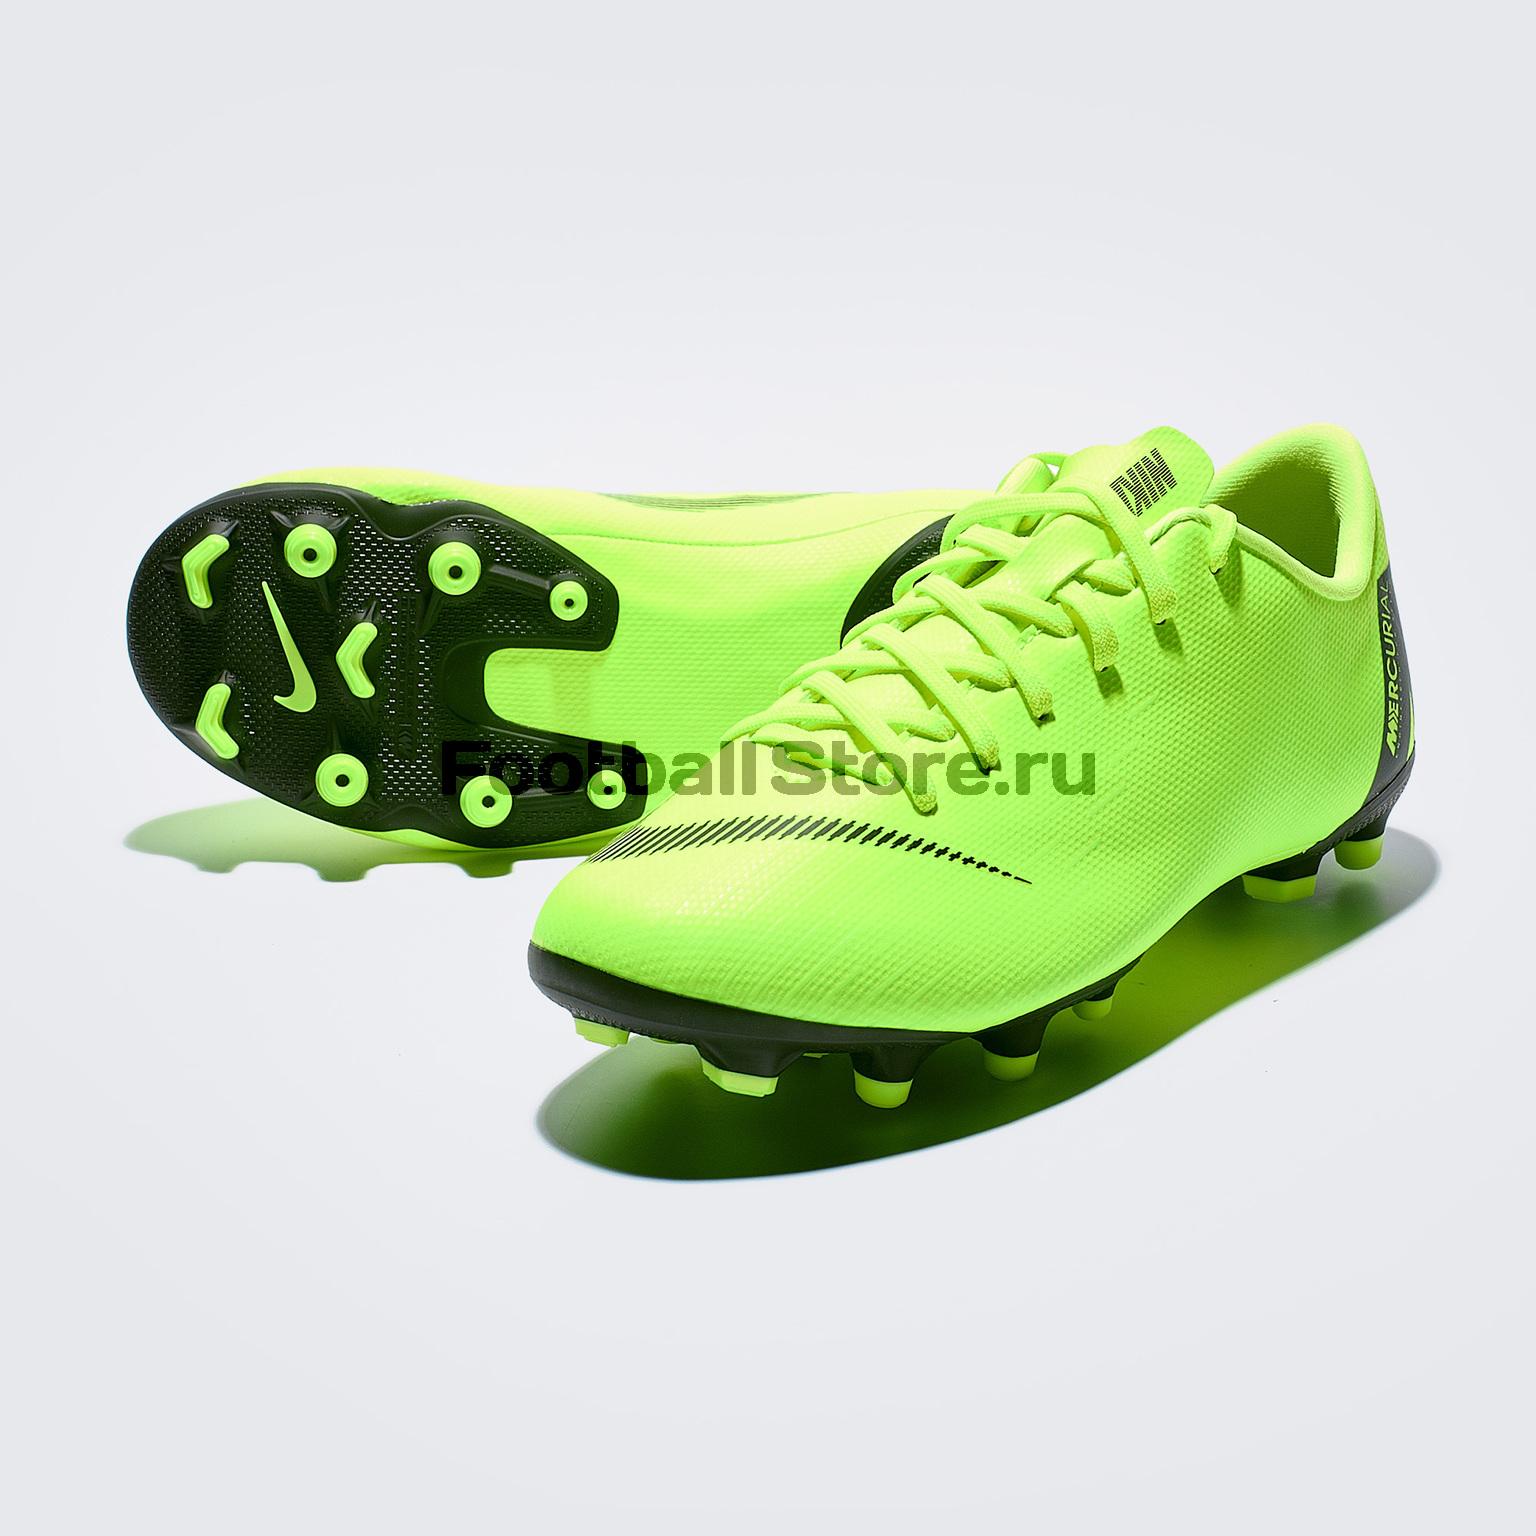 Бутсы детские Nike Vapor 12 Academy GS FG/MG AH7347-701 бутсы детские nike vapor 12 academy gs sg ah7348 001